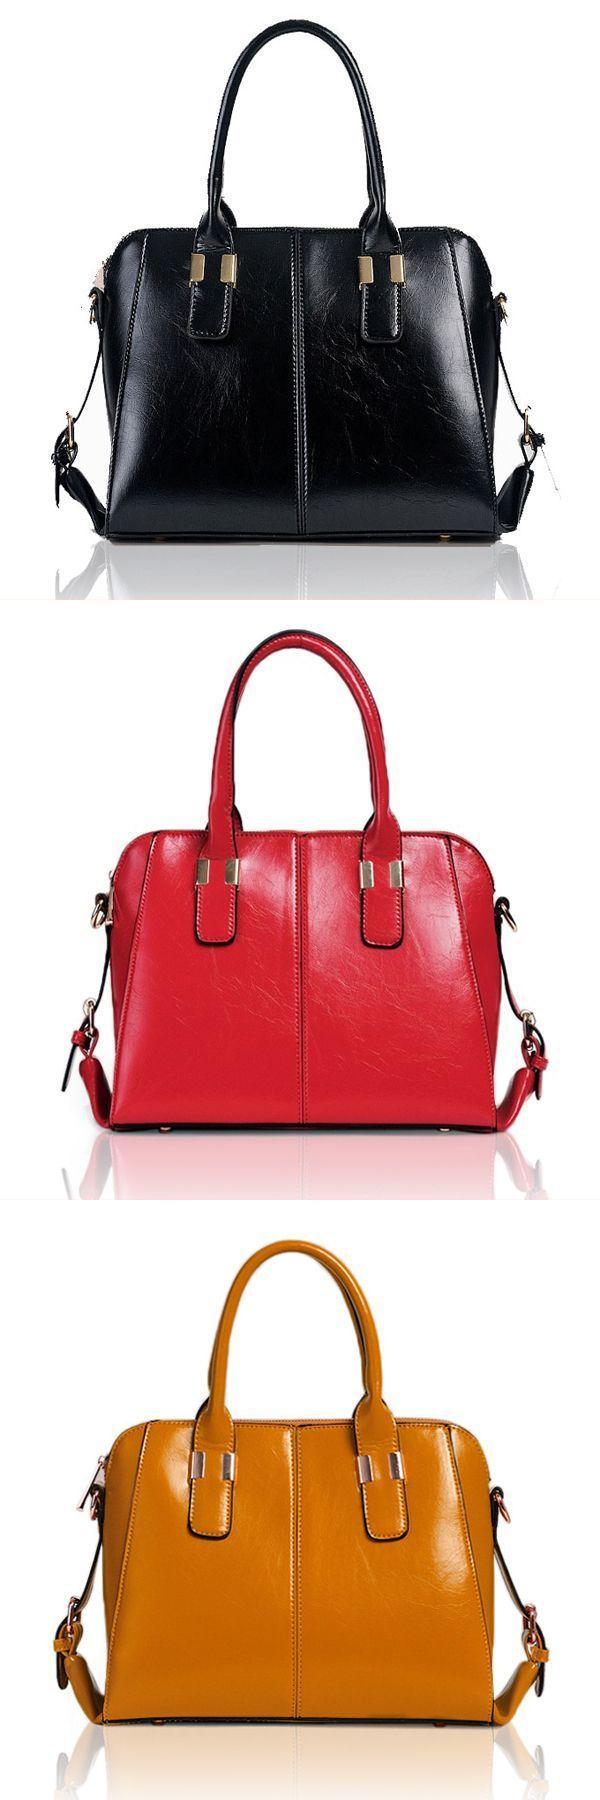 Mix no 6 handbags women pu leather bags vintage totes shell shoulder bag  portable bag   a06fb0b724